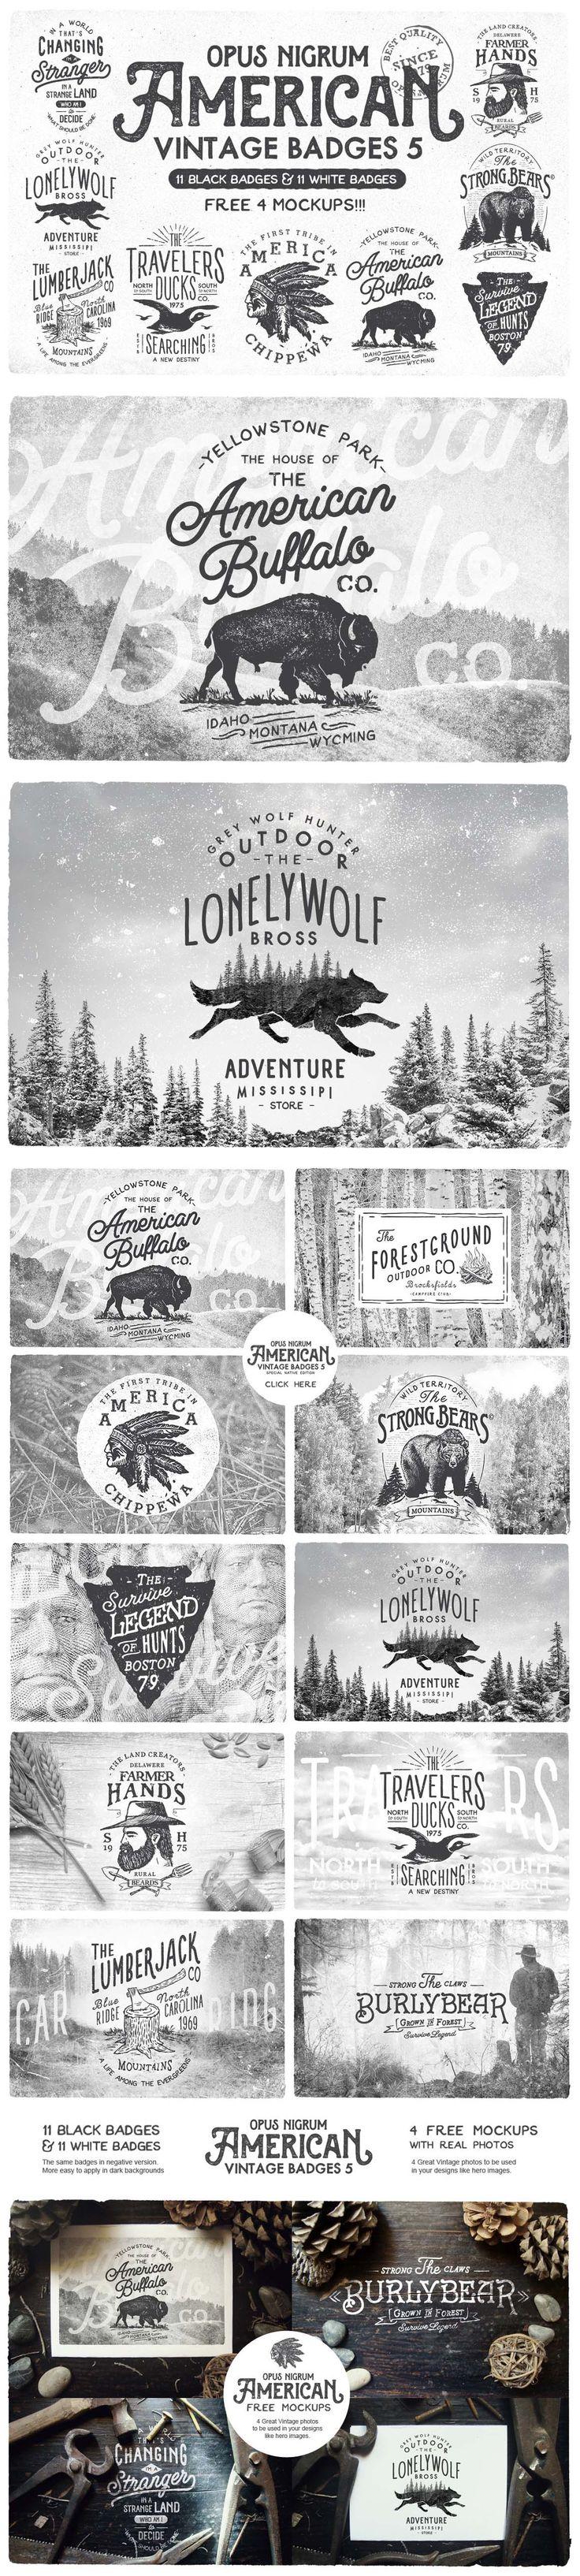 American Vintage Badges #design Download: https://creativemarket.com/OpusNigrum/163961-American-Vintage-Badges-5?u=ksioks